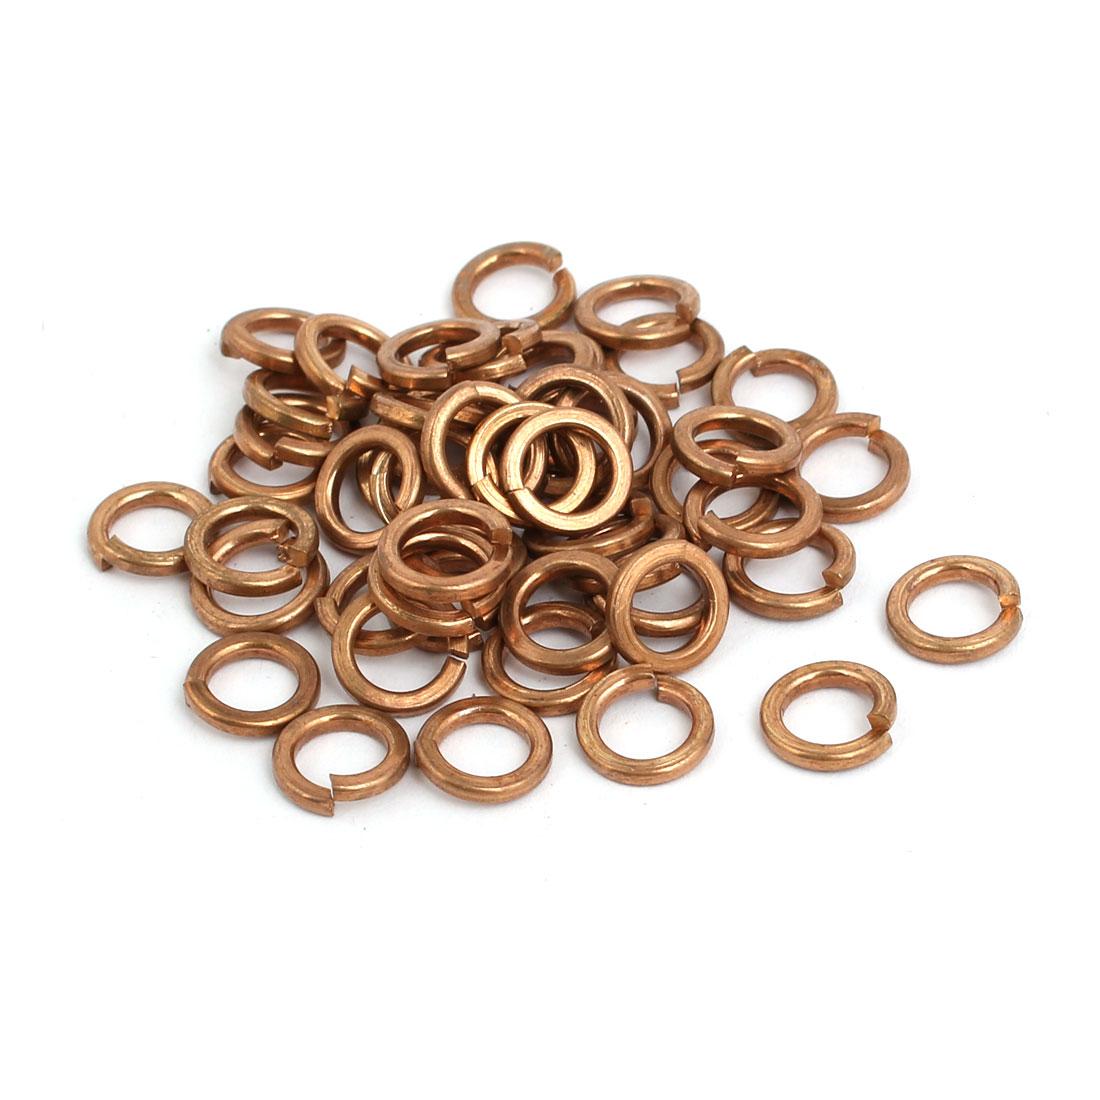 50pcs 5mm Inner Dia Brass Split Lock Spring Washer Ring Gasket Copper Tone